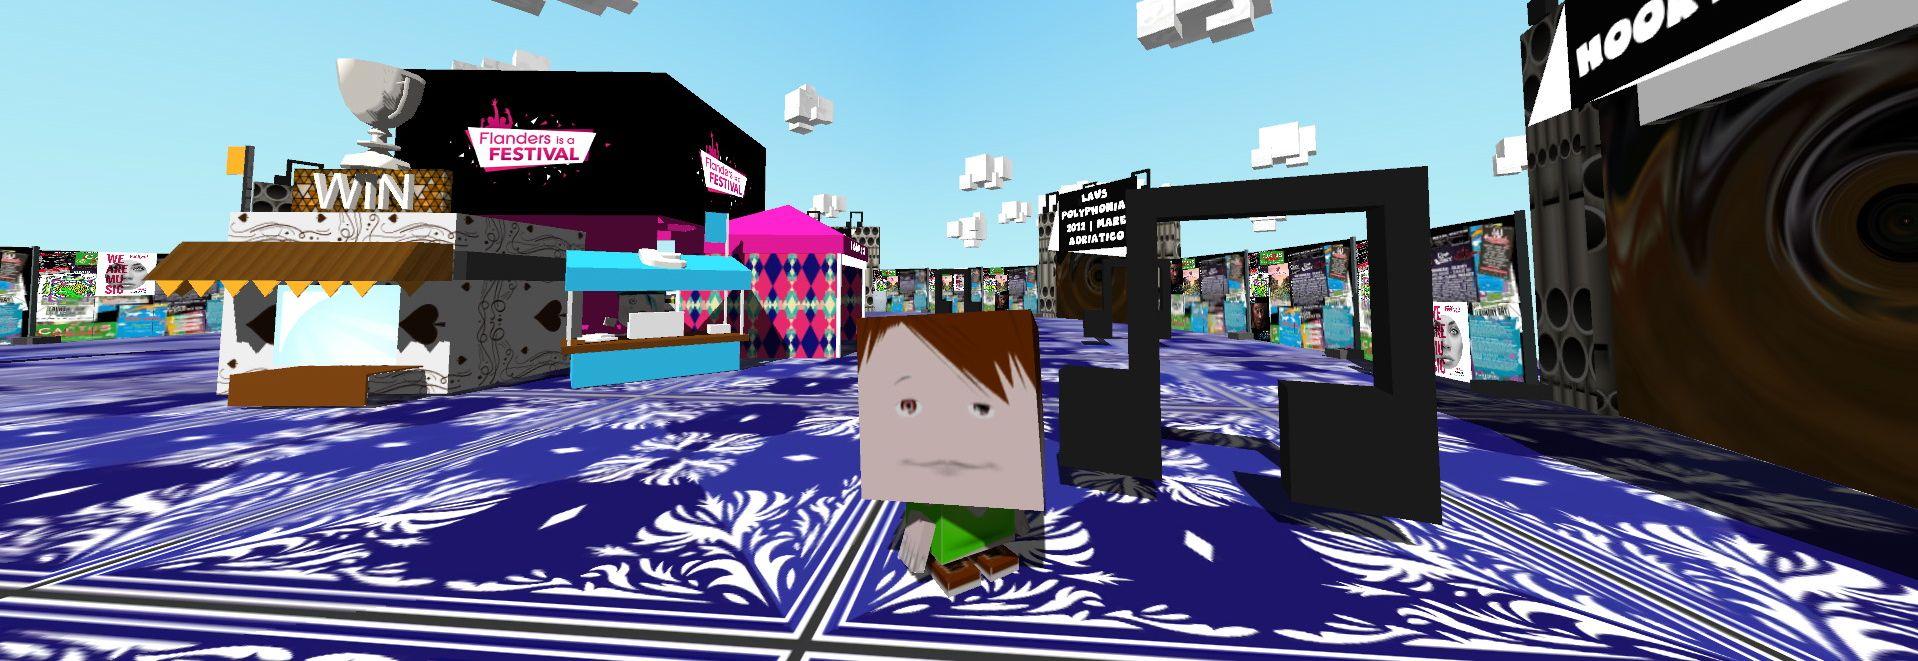 Toerisme Vlaanderen lanceert 3D game 'Flanders is a Festival'